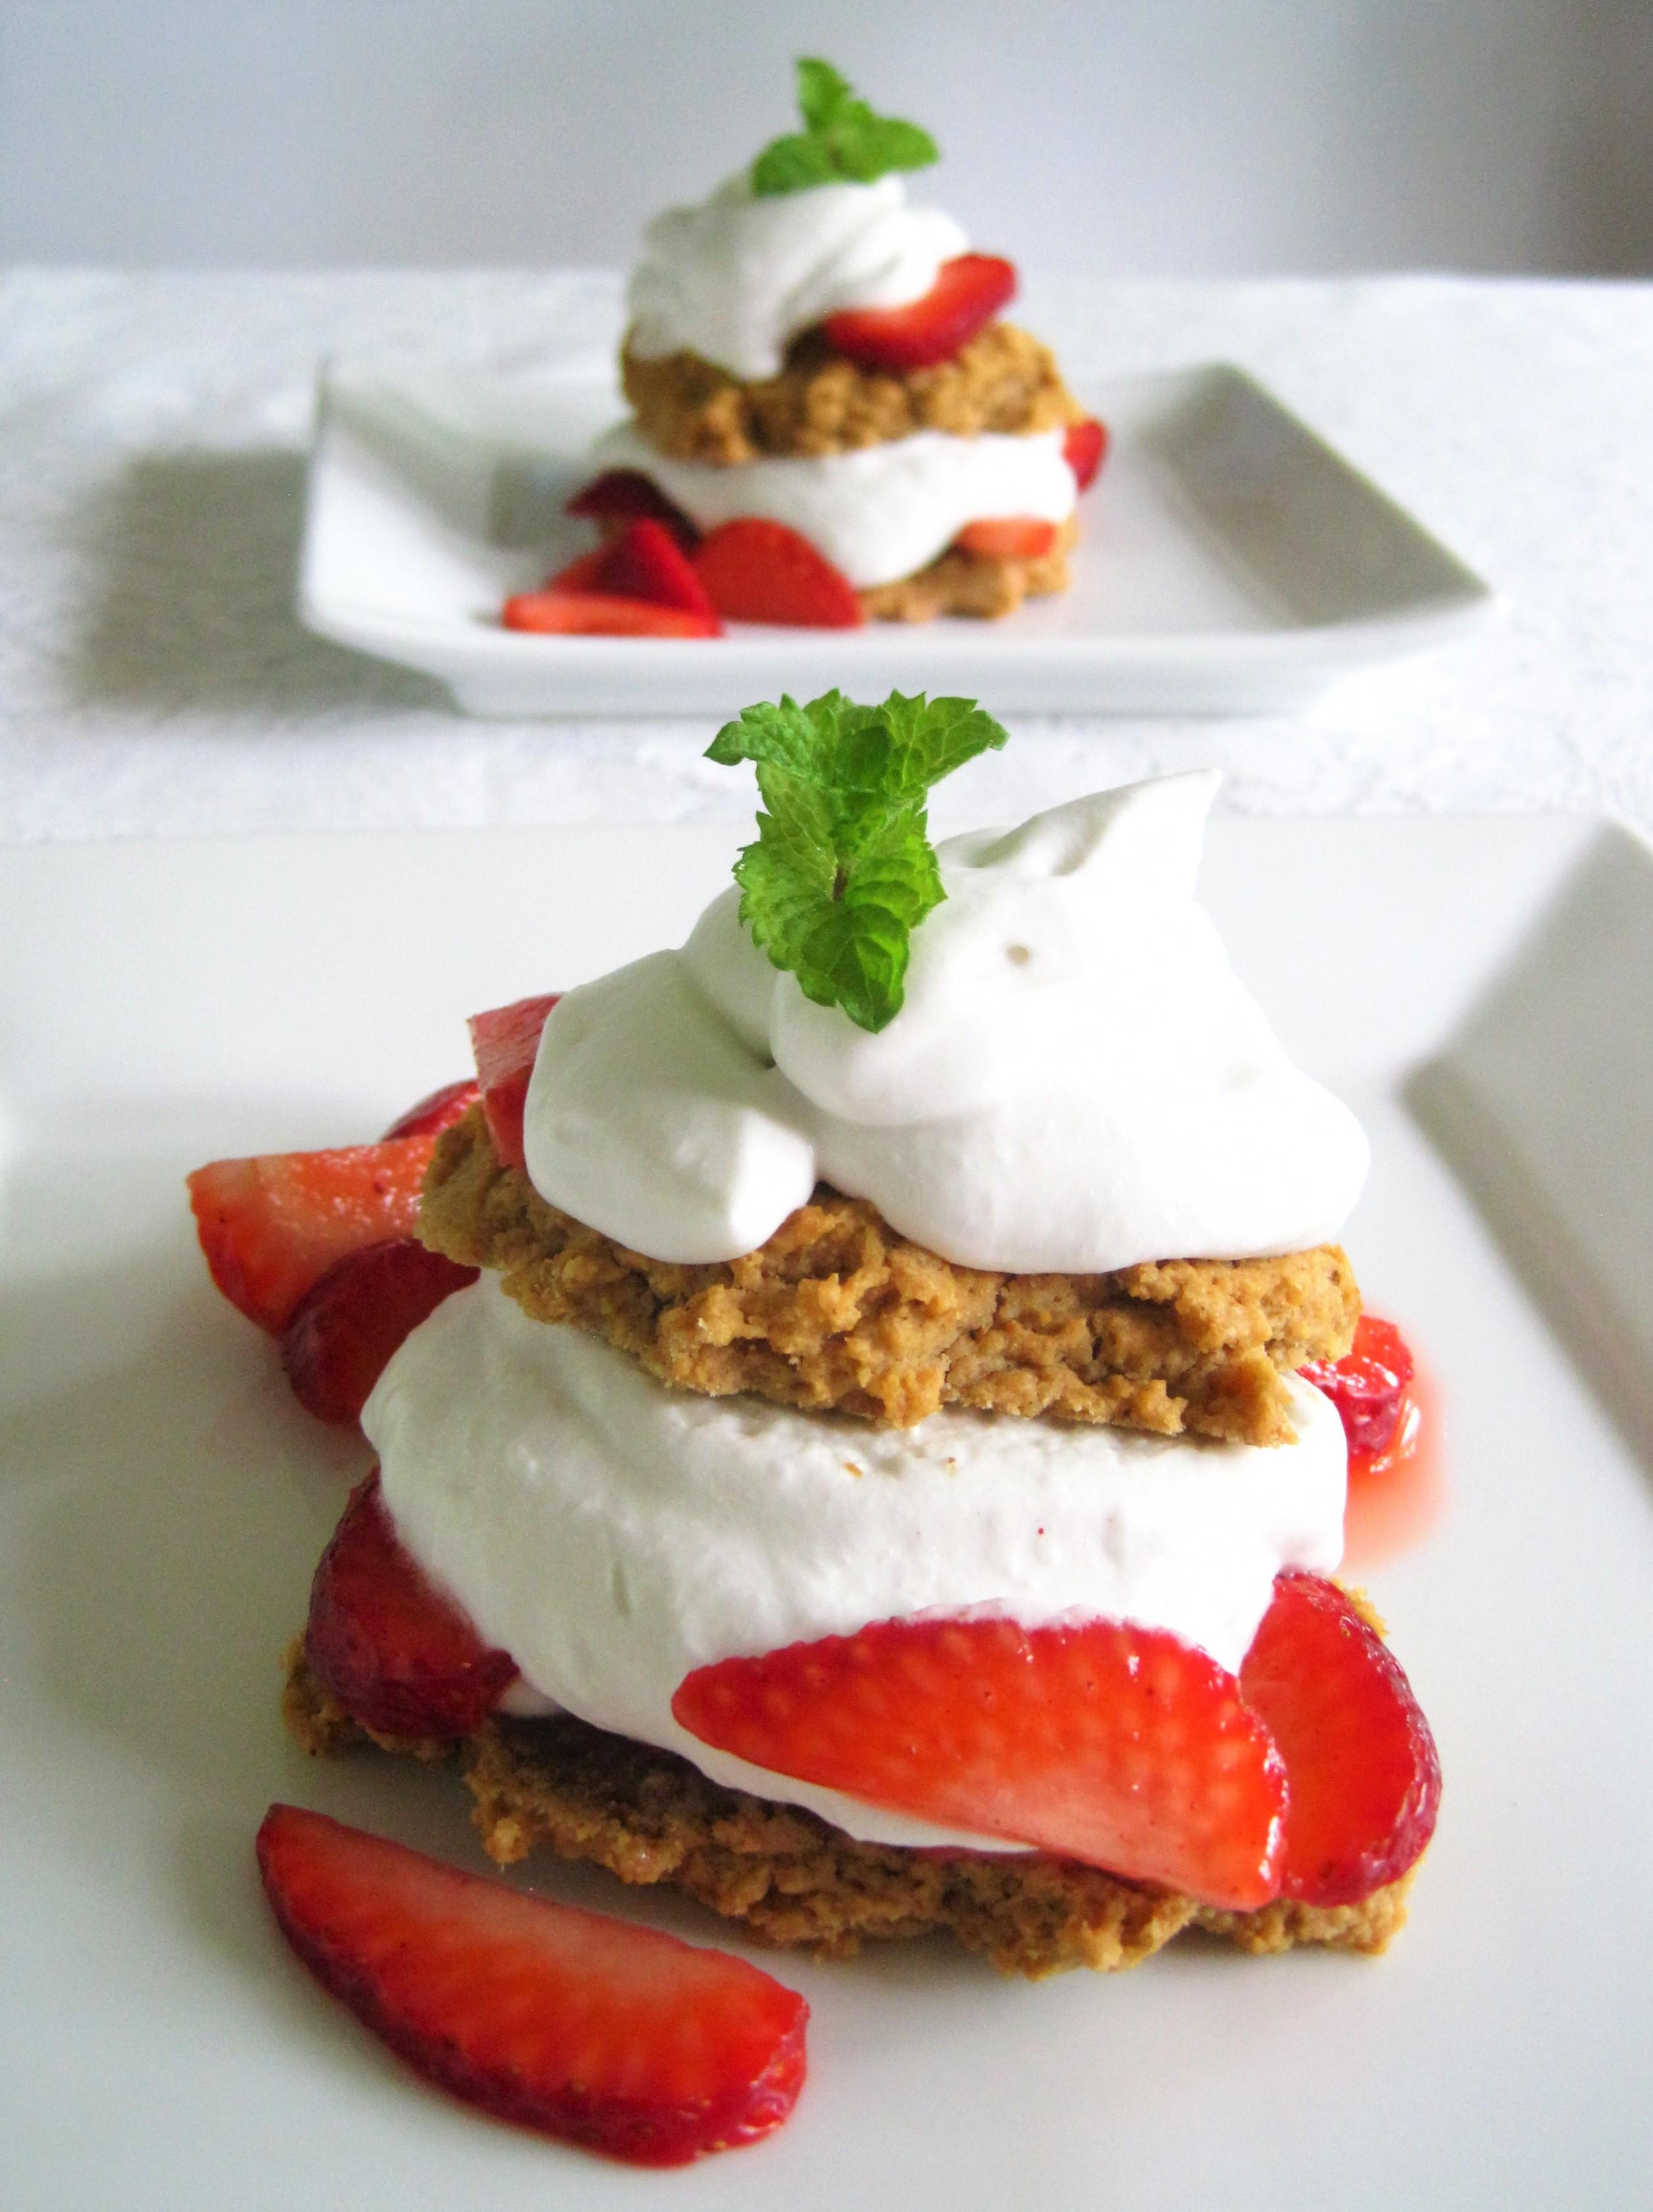 Vegan Aip Recipes  Strawberry Shortcake paleo AIP vegan Flash Fiction